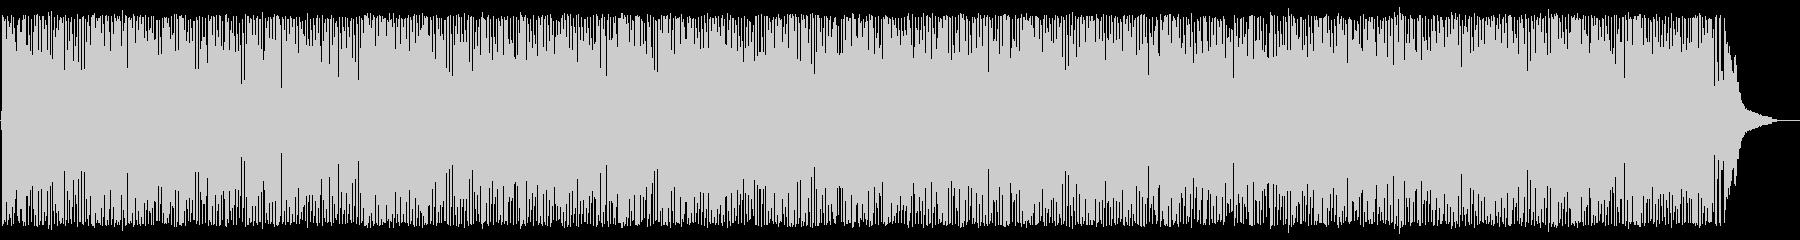 G線上のアリア(acoustic)の未再生の波形